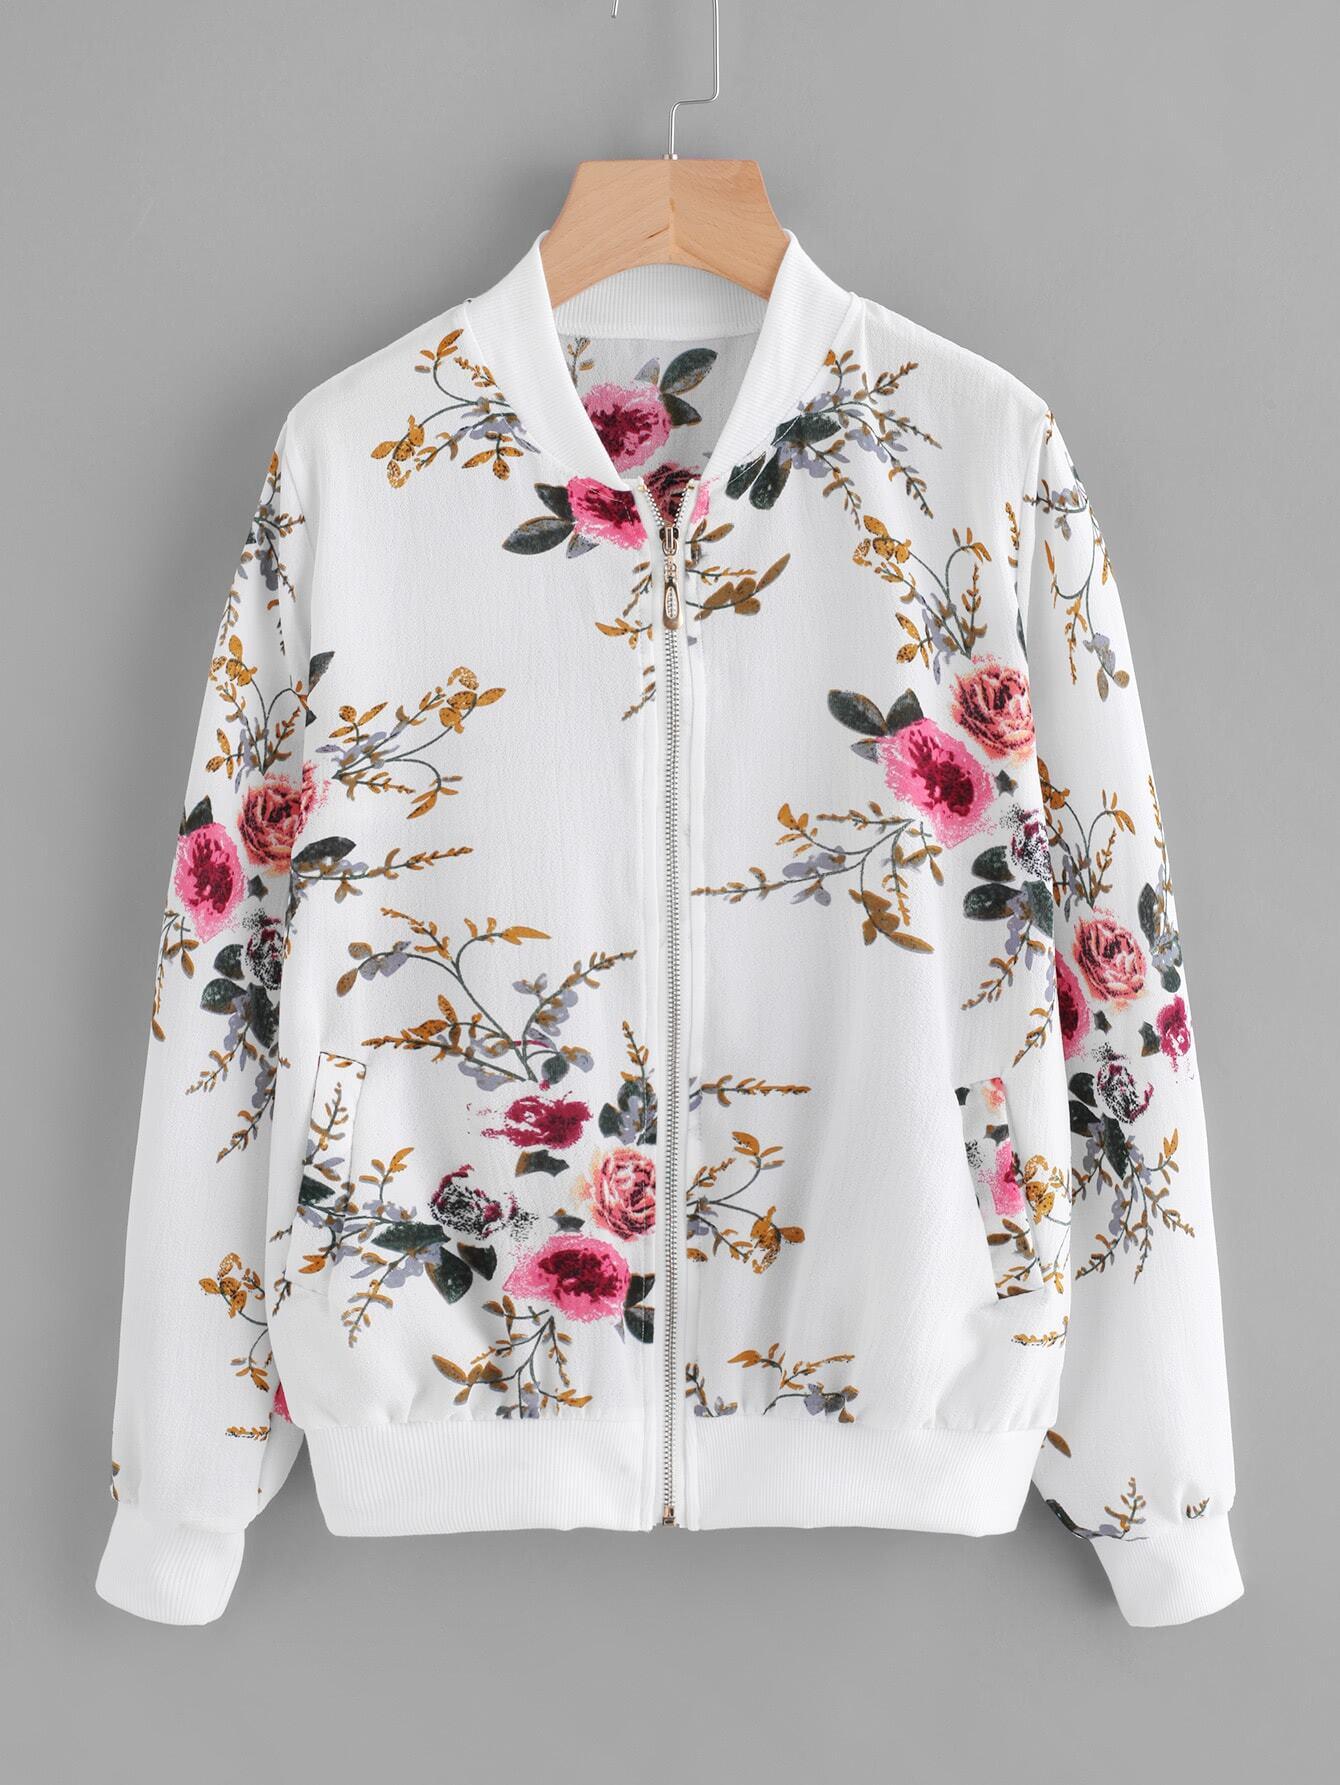 Ribbed Trim Botanical Print Jacket contrast ribbed trim jacket